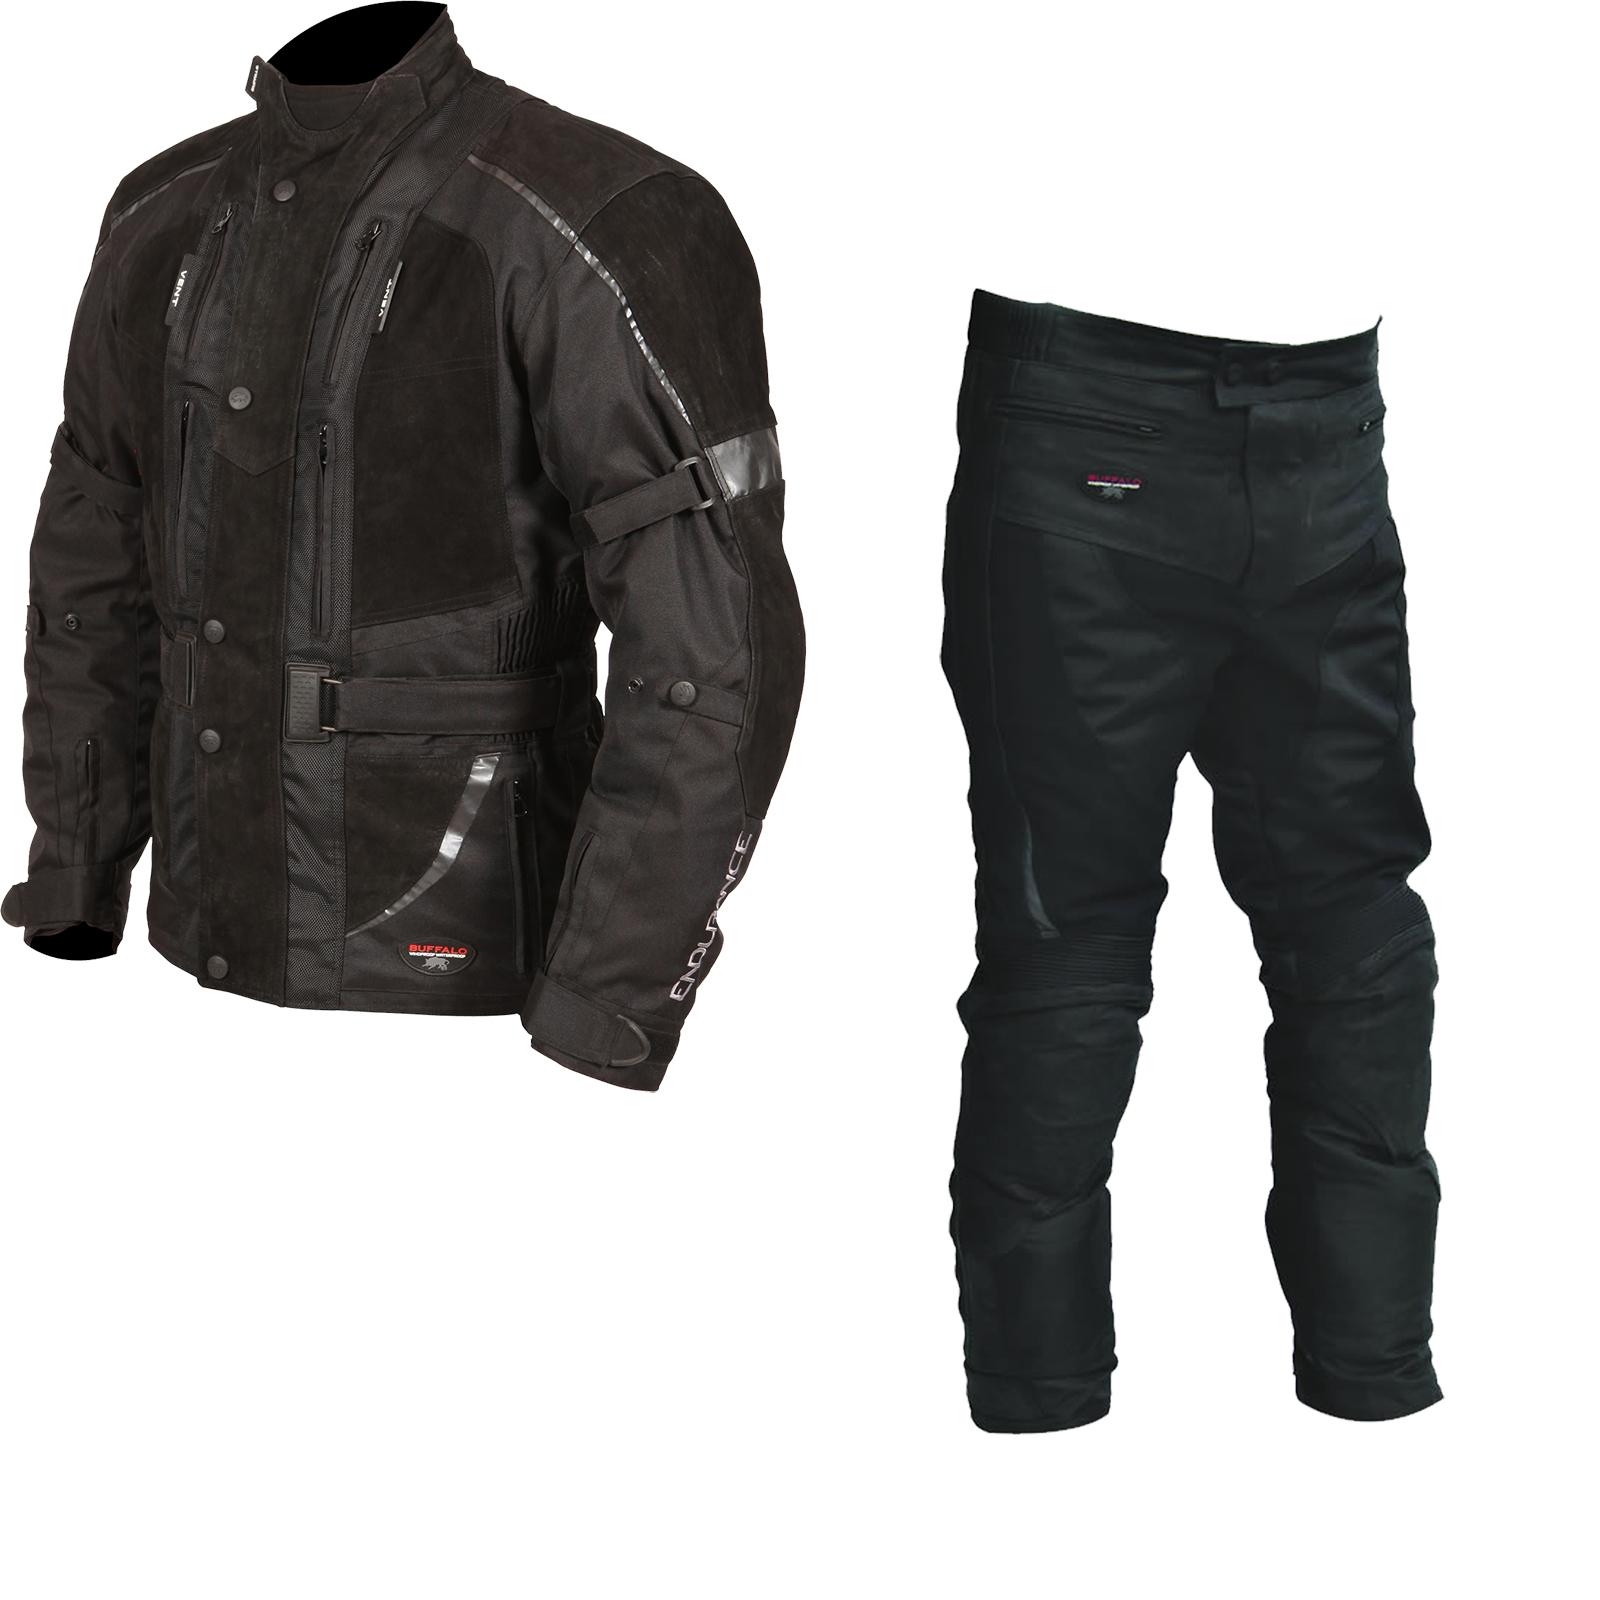 Buffalo Endurance Motorcycle Jacket Trousers Black Kit Buffalo Ghostbikes Com